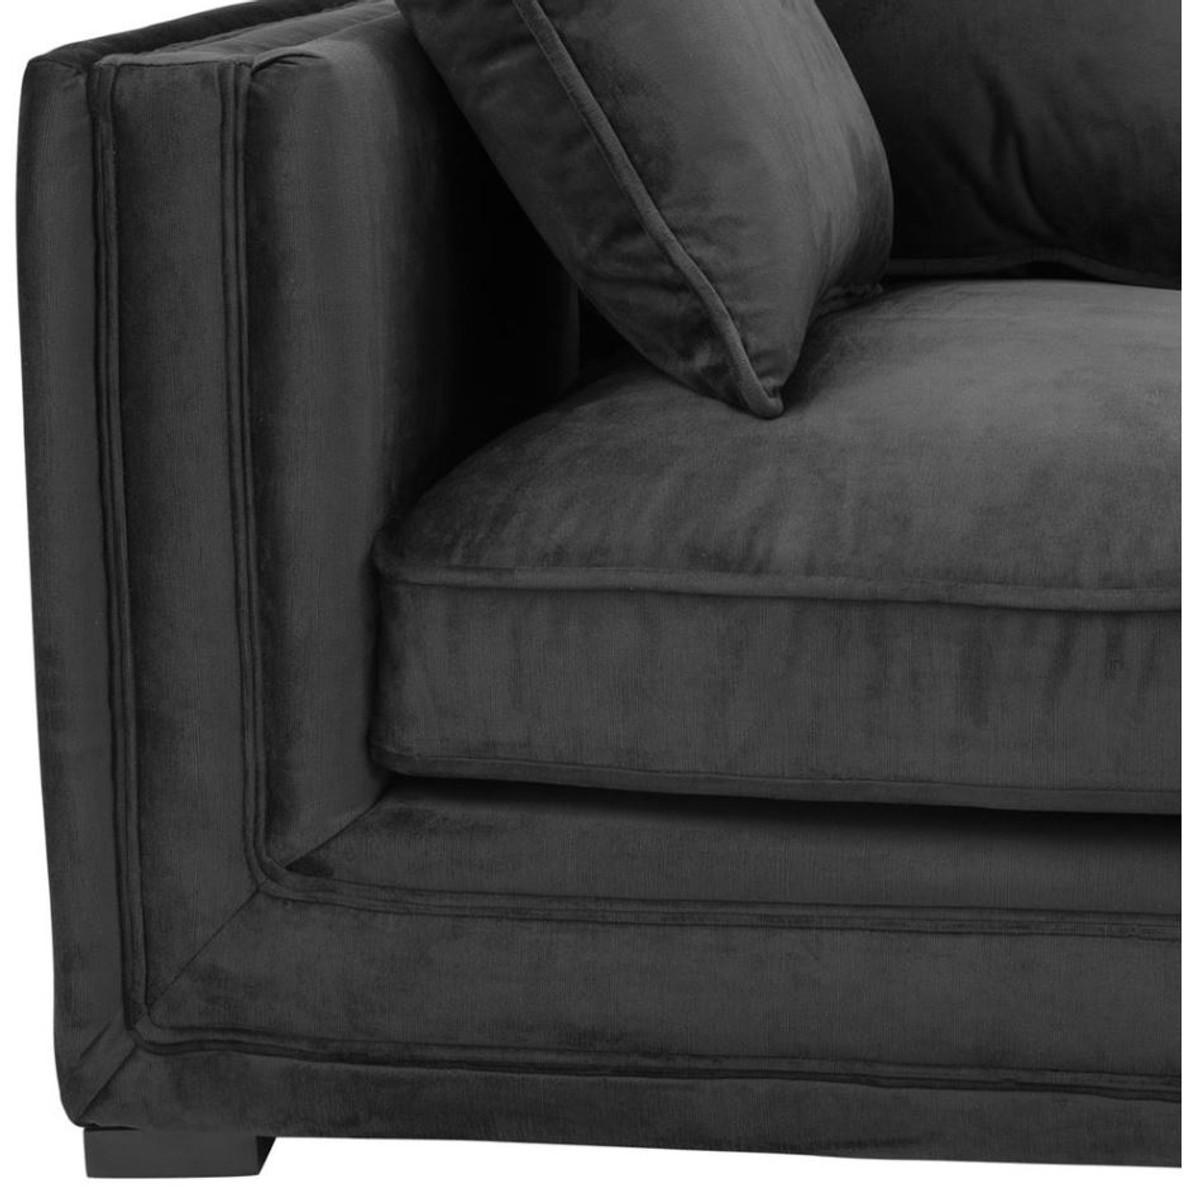 casa padrino luxus designer 3er sofa schwarz luxus hotel. Black Bedroom Furniture Sets. Home Design Ideas